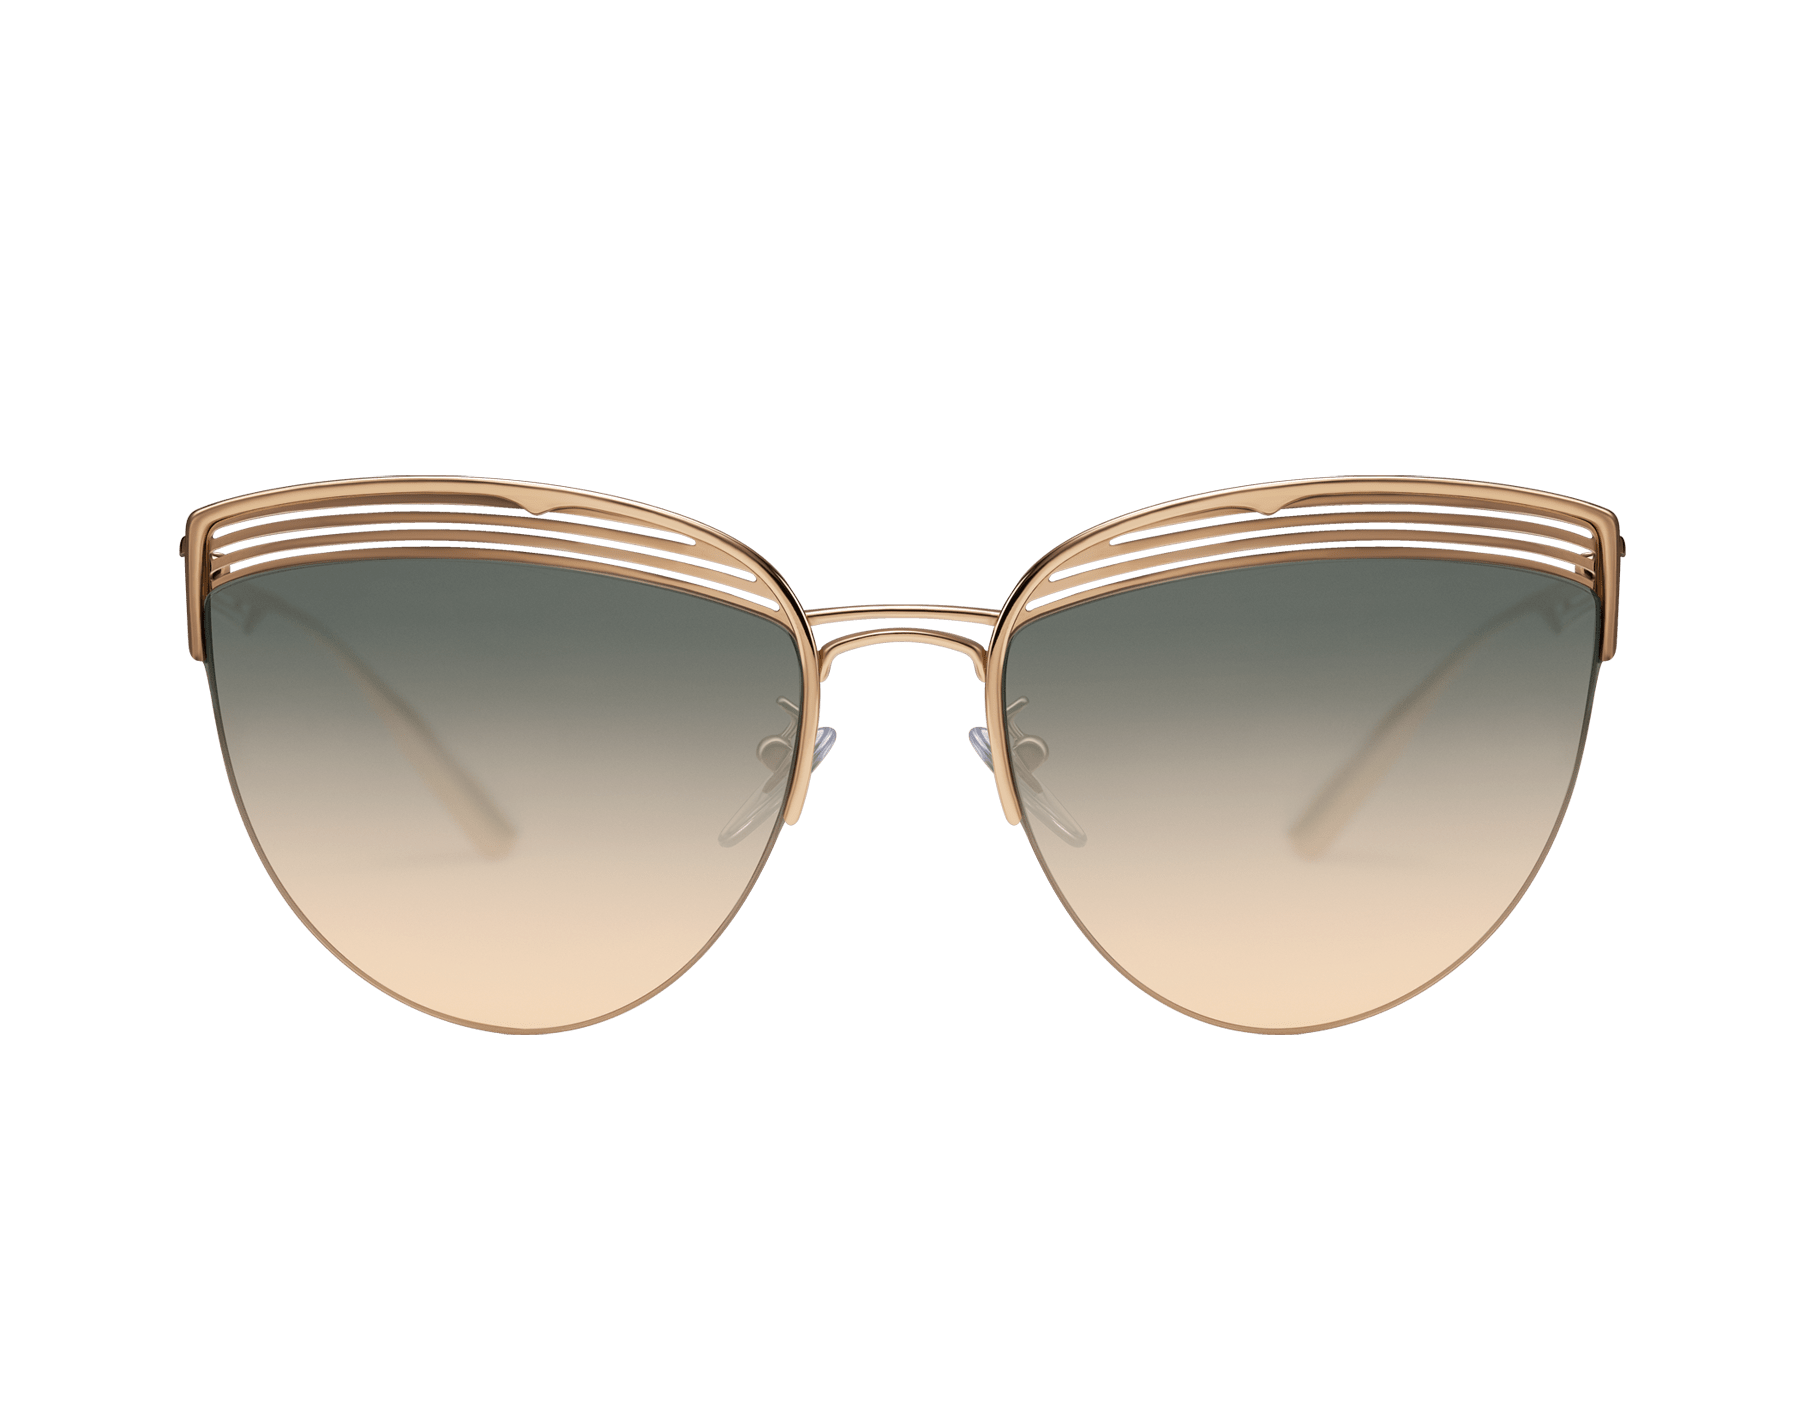 Gafas de sol Bvlgari B.zero1 B.purevibes de ojo de gato con semiarmazón en metal. 903895 image 2